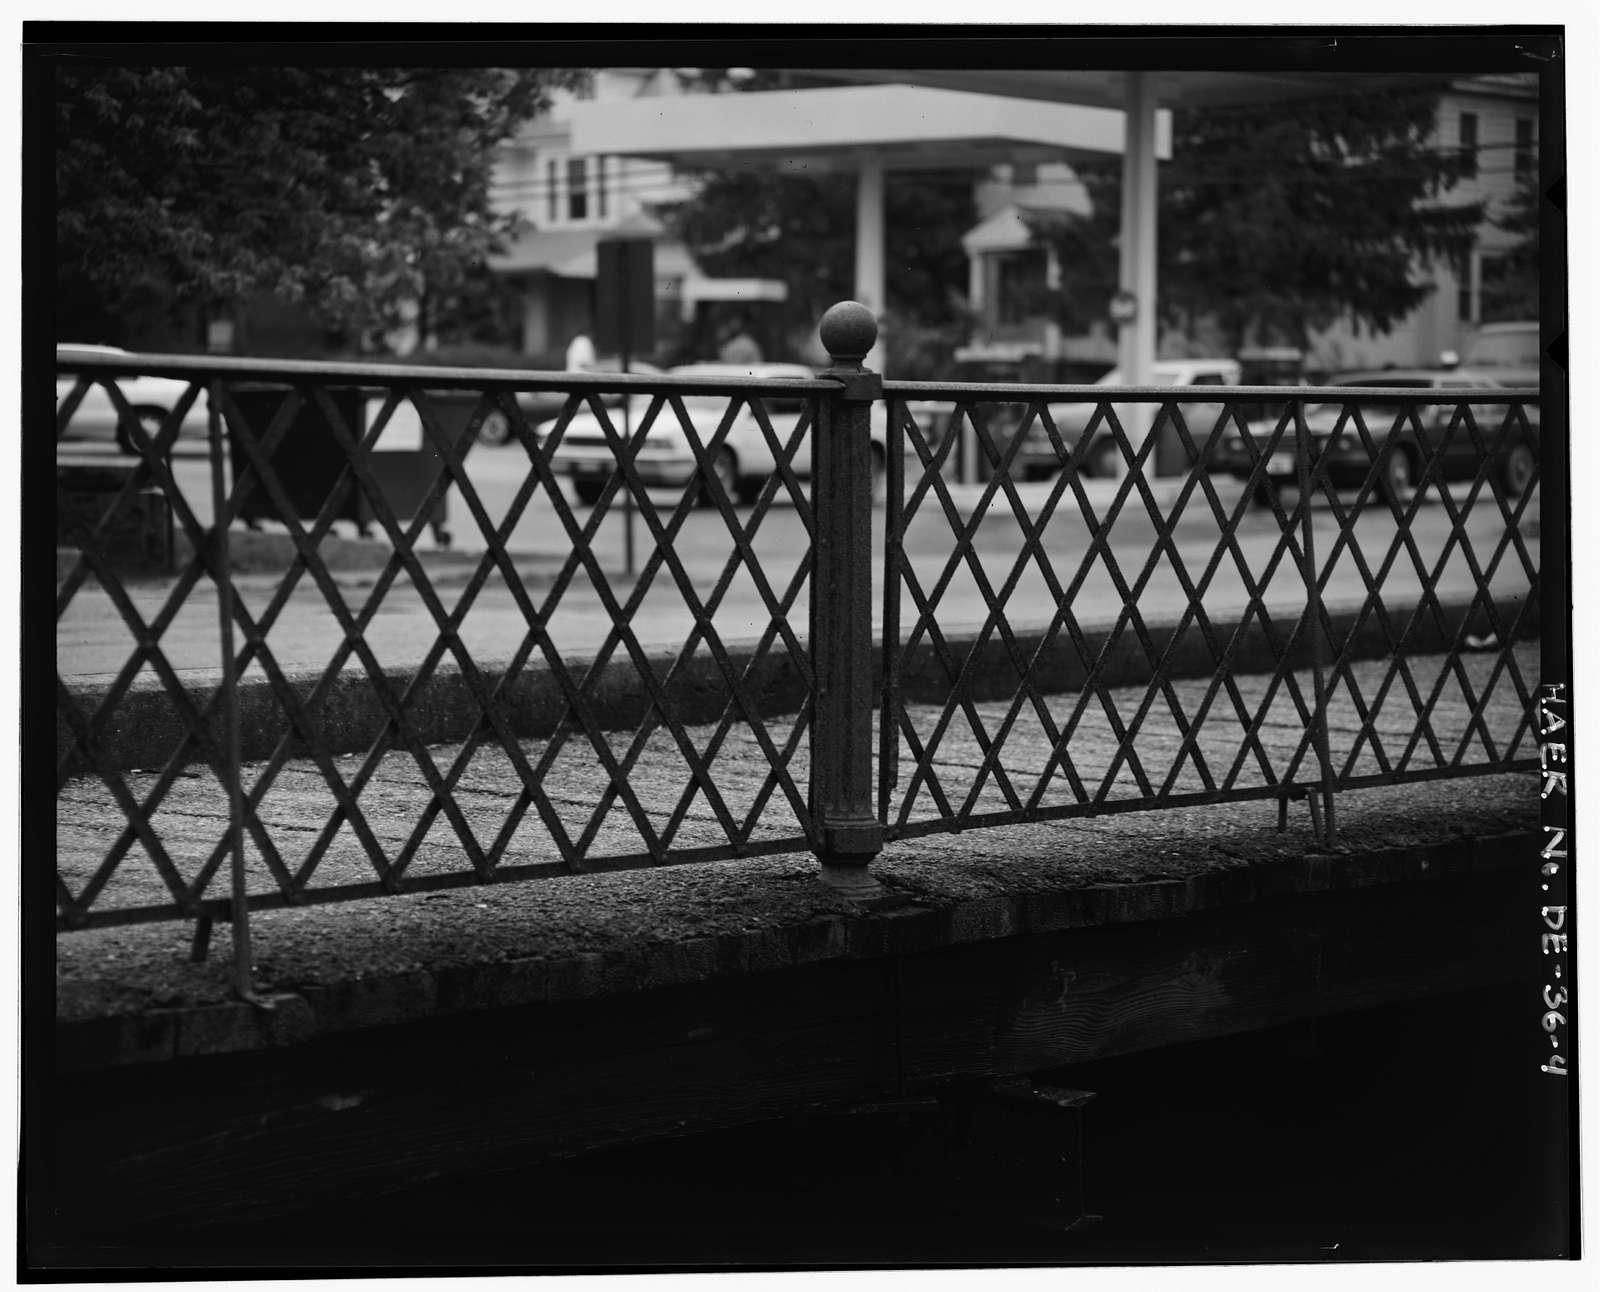 Railroad Avenue Bridge, Spanning Mispillion River on Church Street, Milford, Sussex County, DE